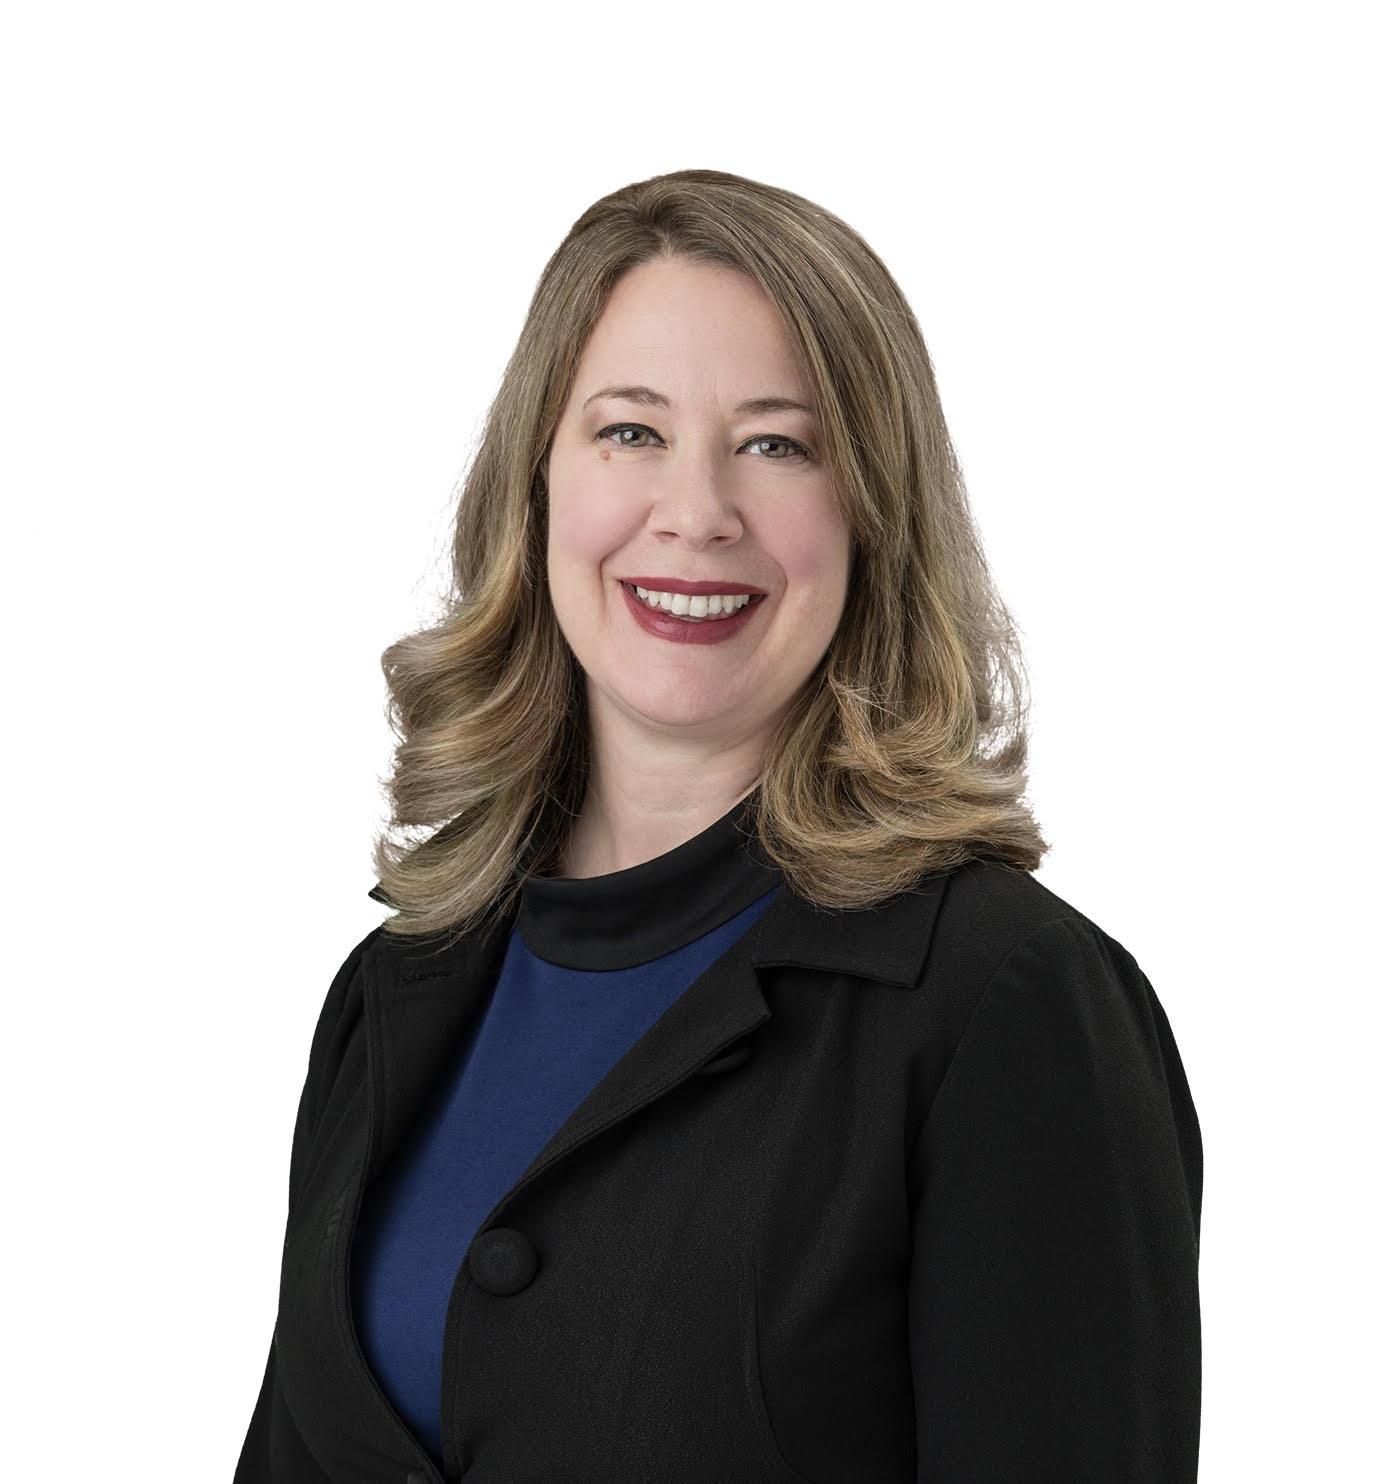 Nancy Vailakis